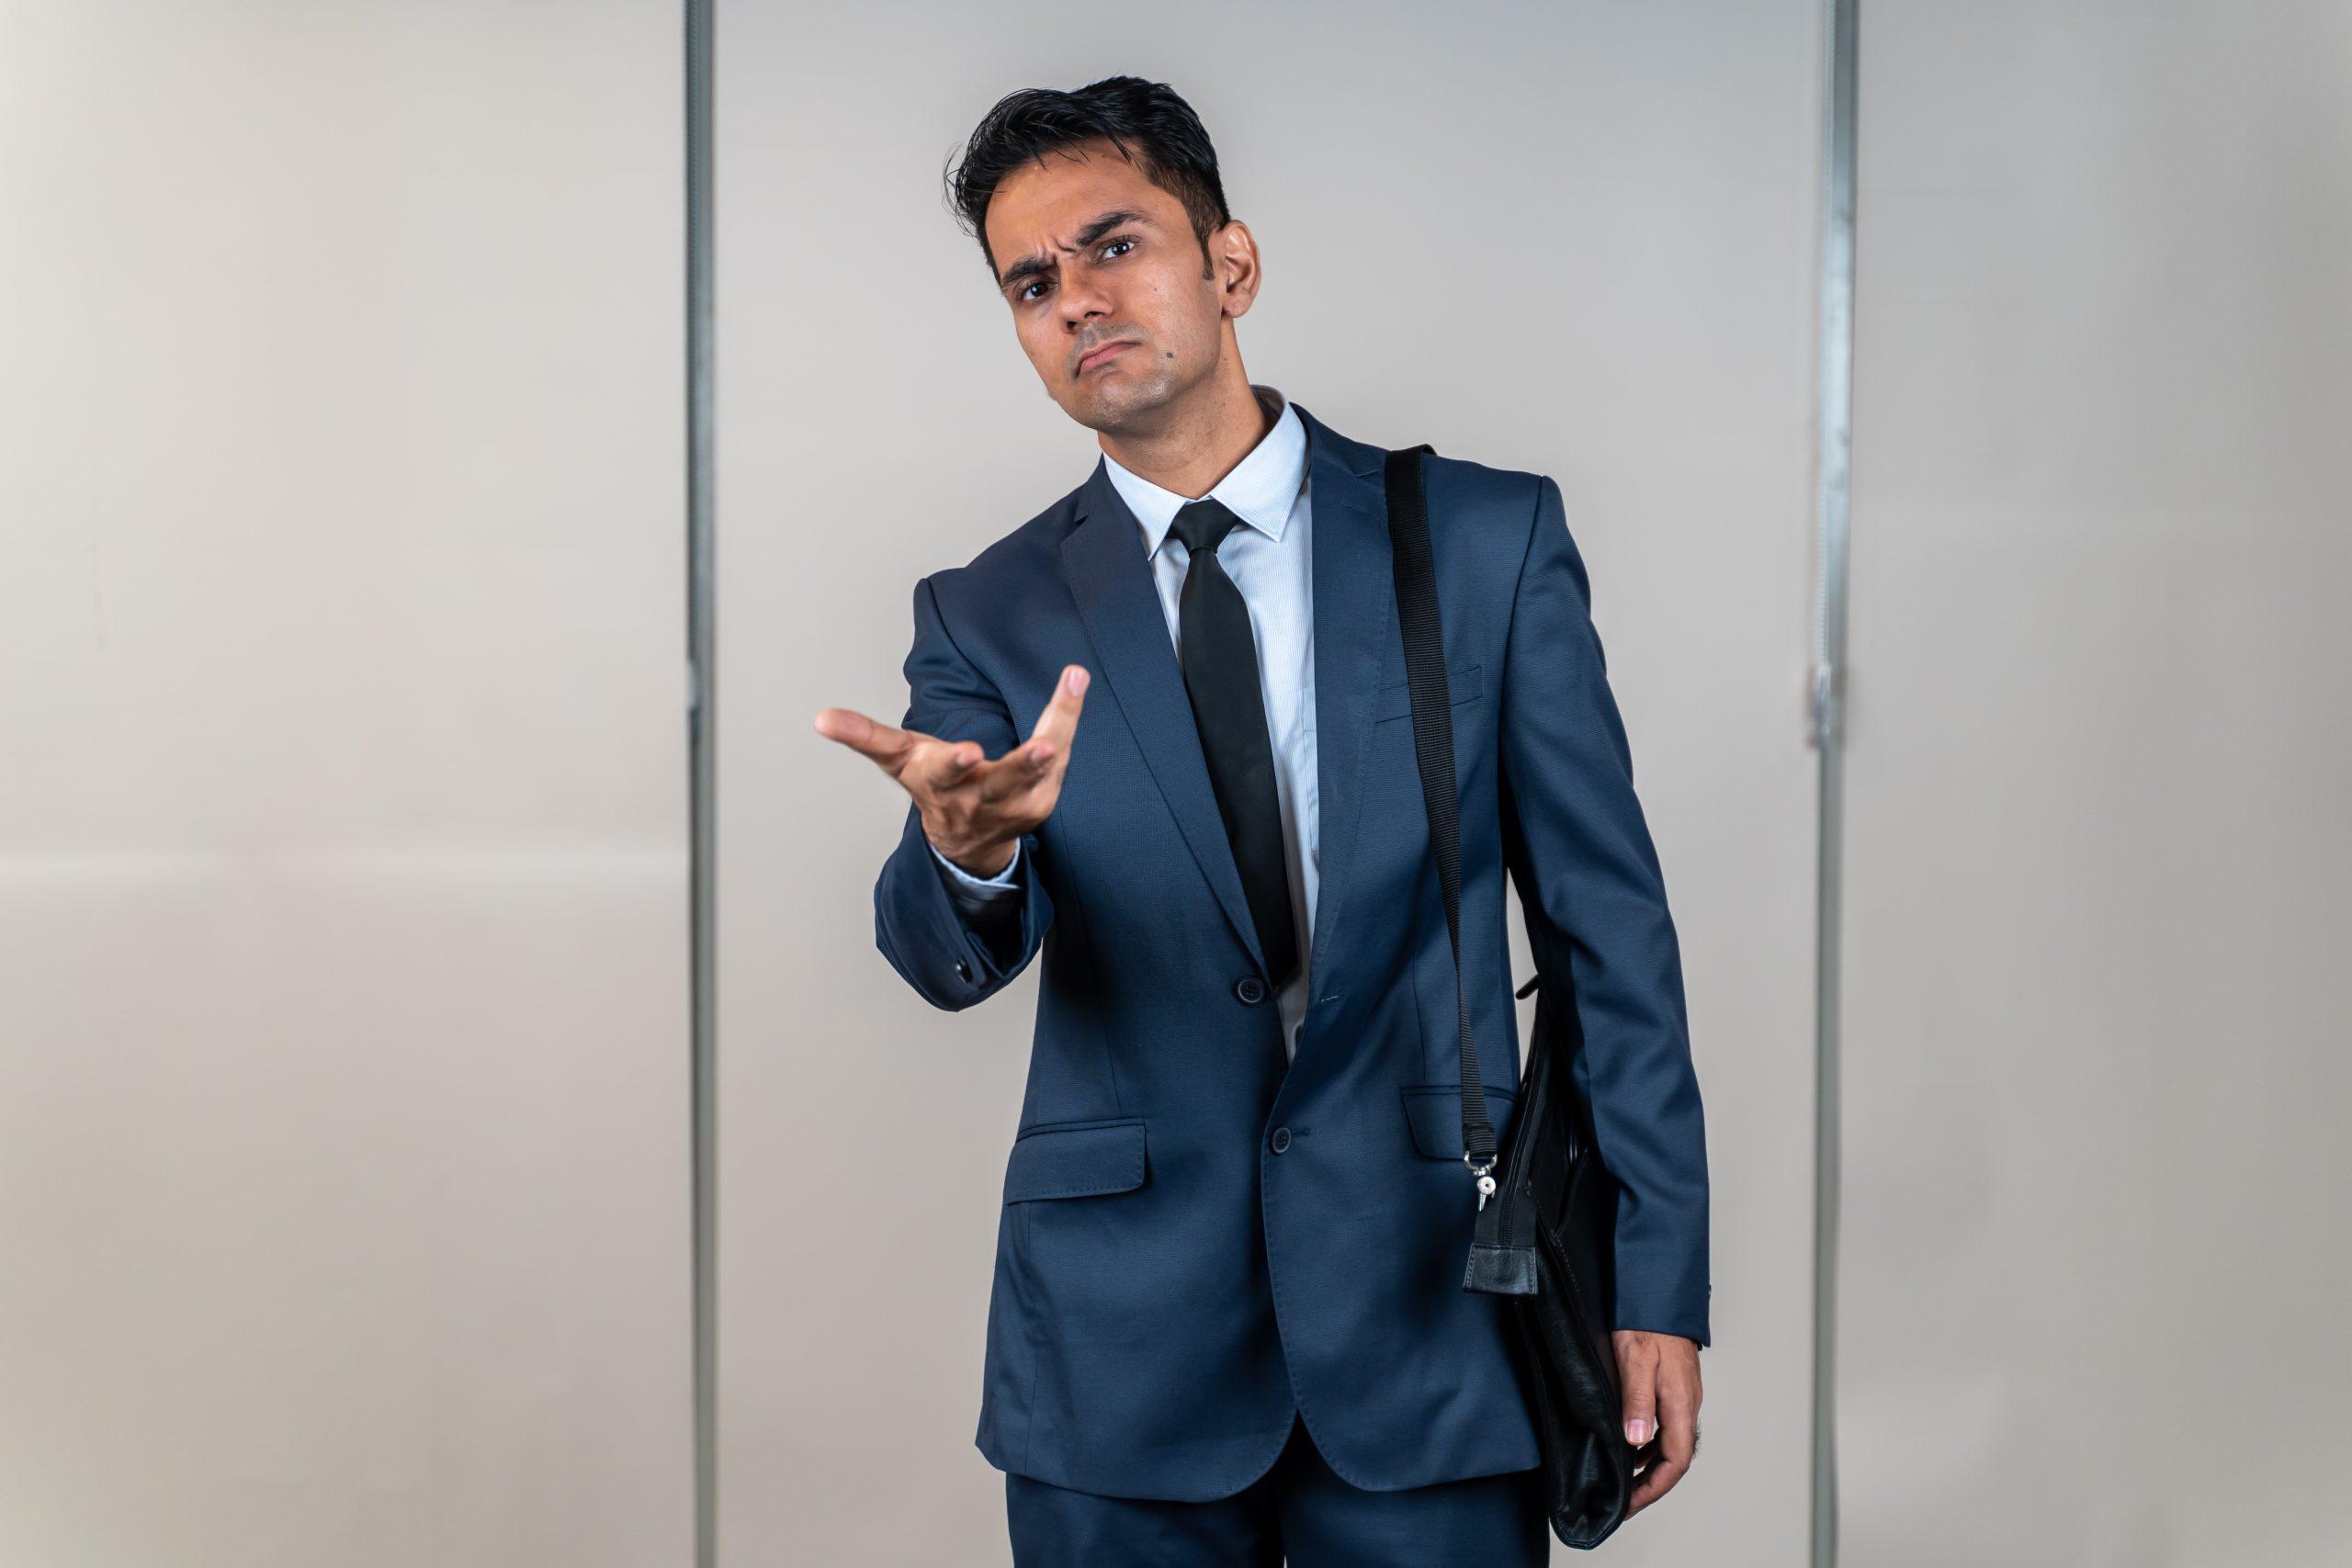 A businessman asking something